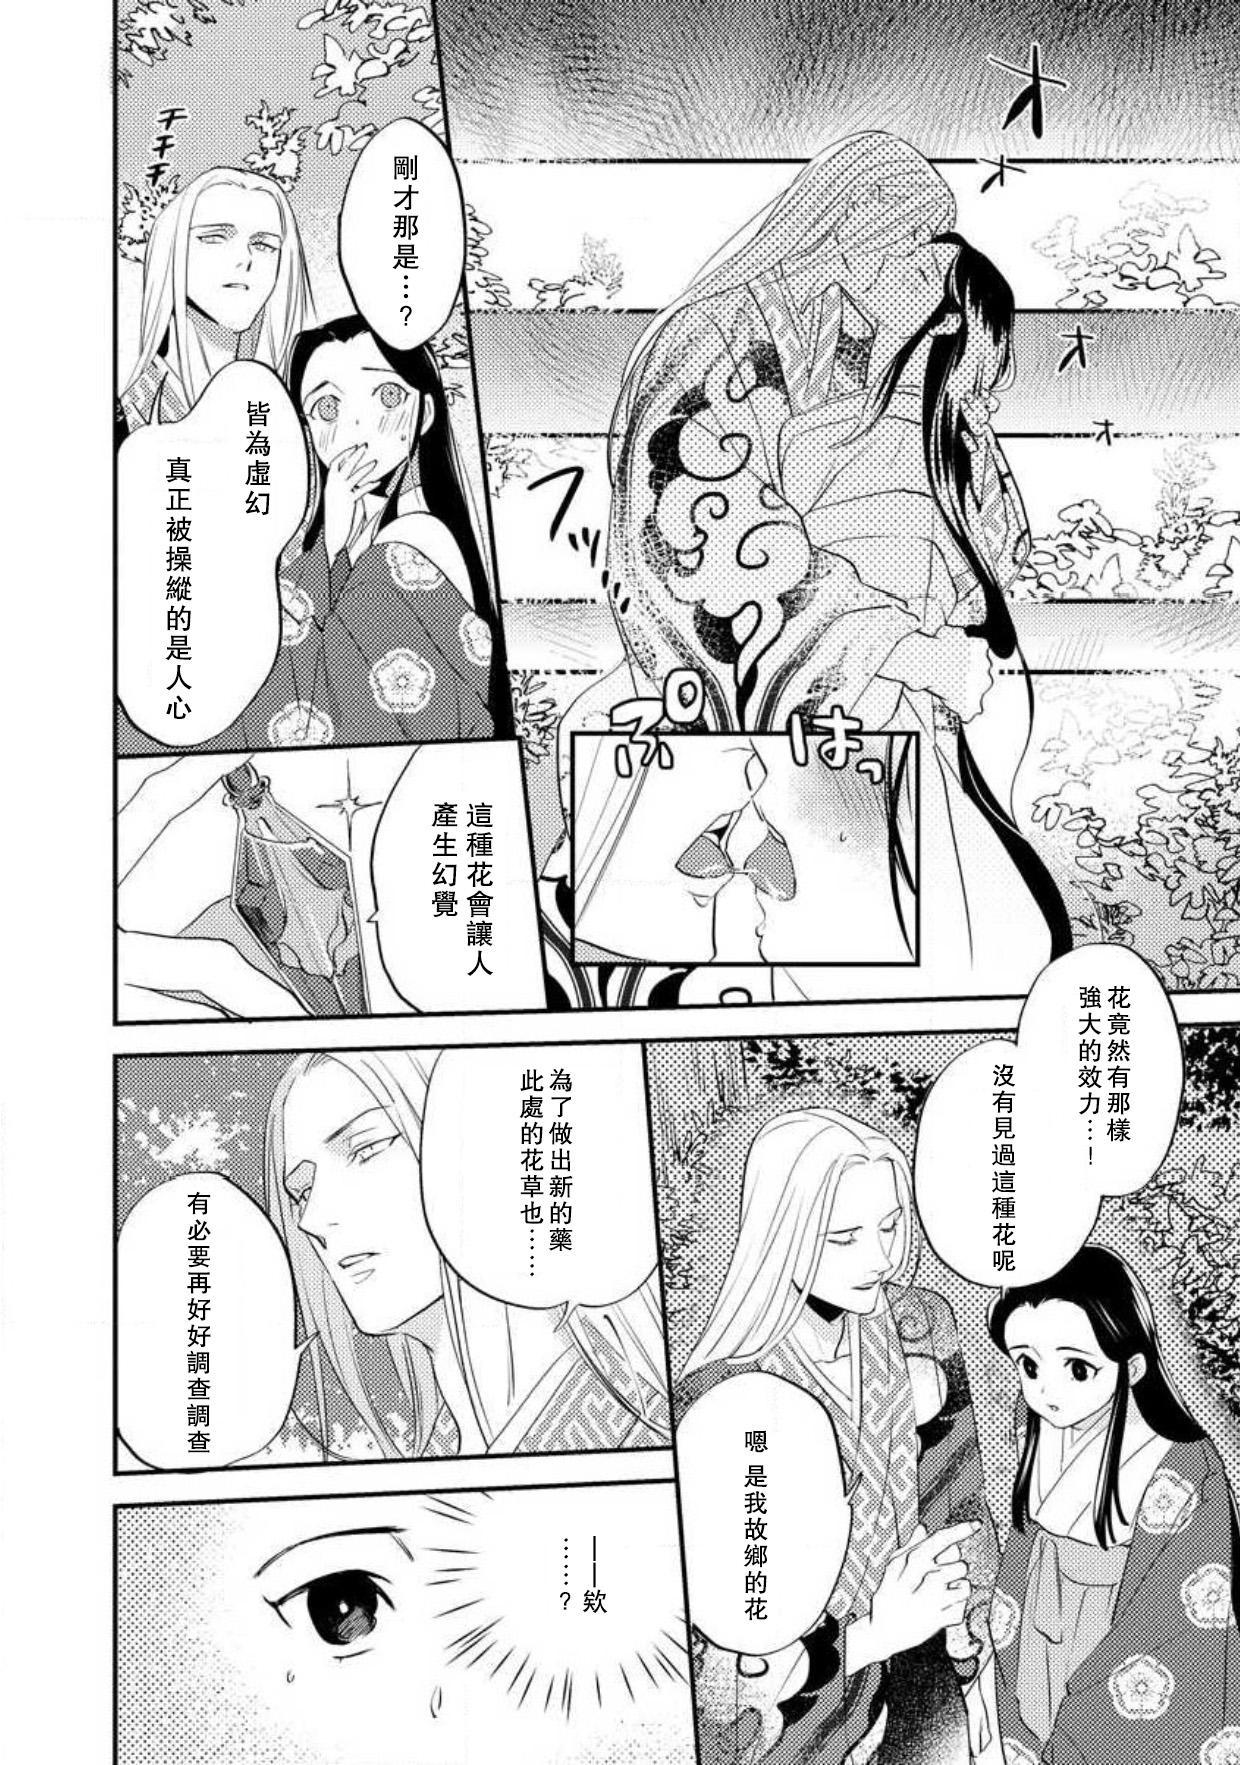 Oeyama suimutan utsukushiki oni no toraware hime | 大江山醉夢逸話 美麗的鬼與被囚禁的公主 Ch. 1-8 185